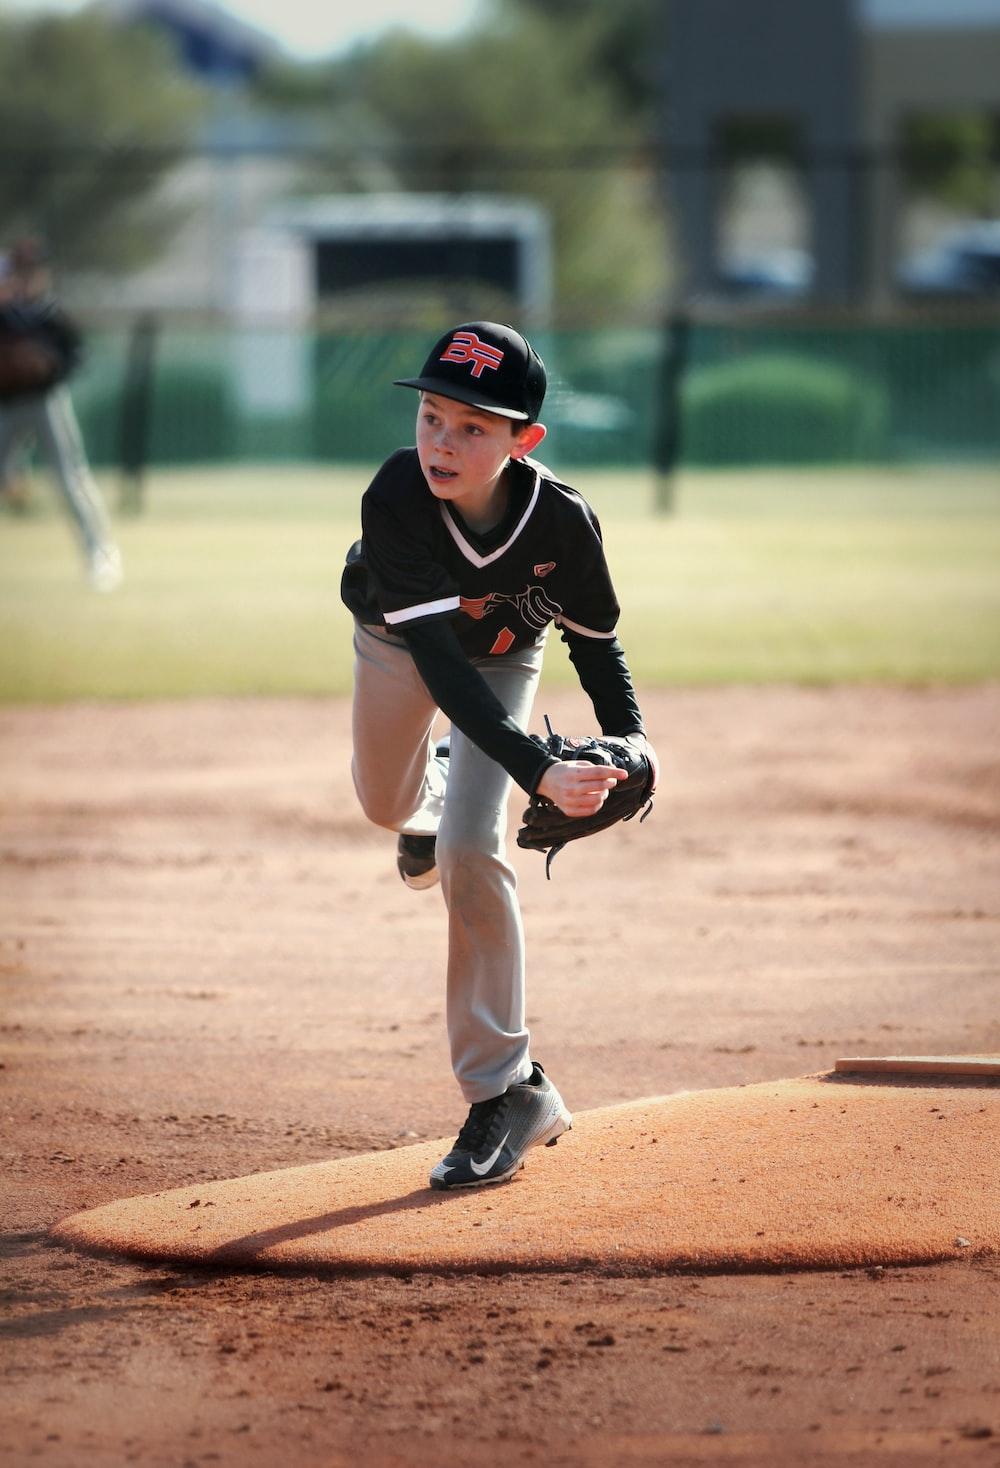 shallow focus photo of boy wearing black baseball jersey